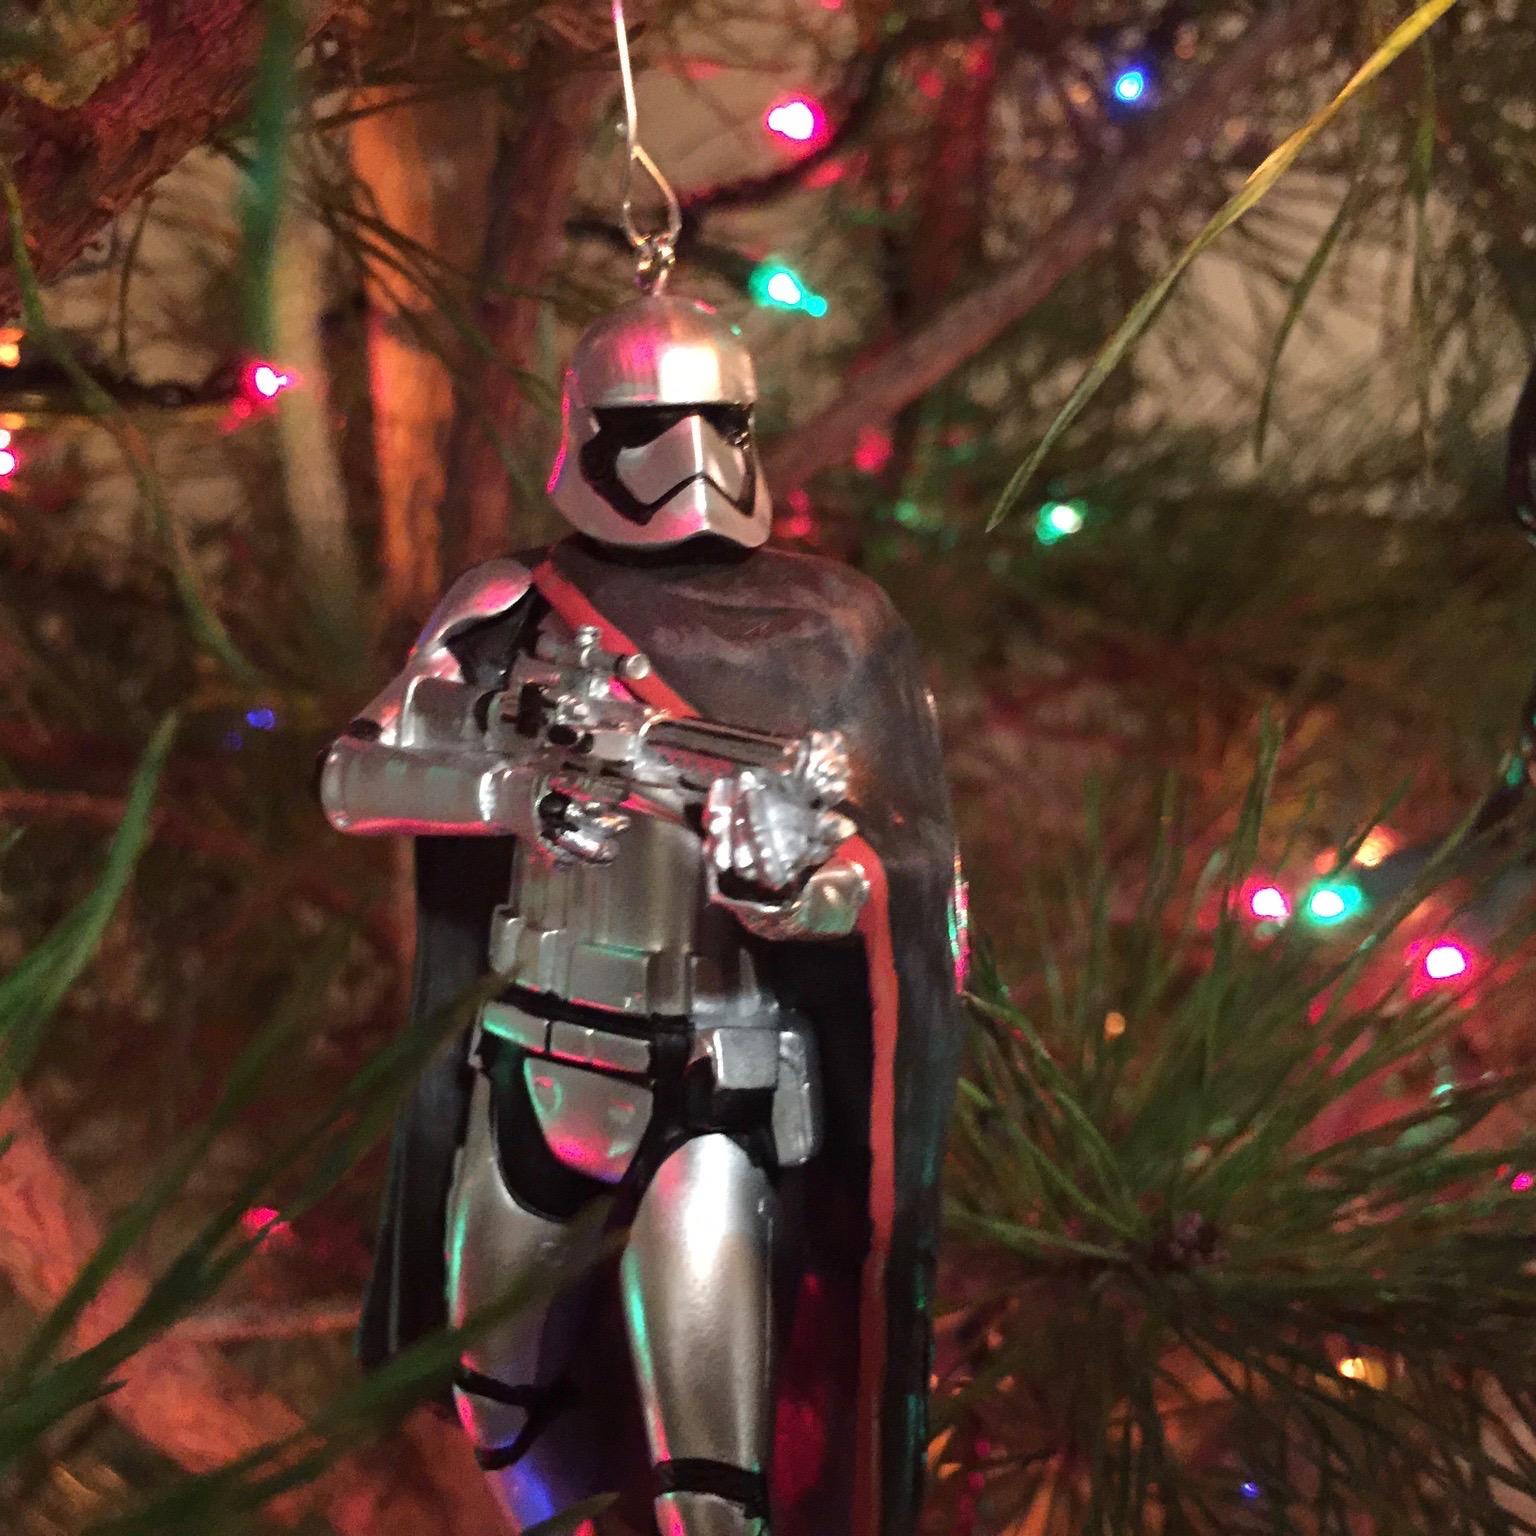 Captain Phasma ornament on our Christmas tree